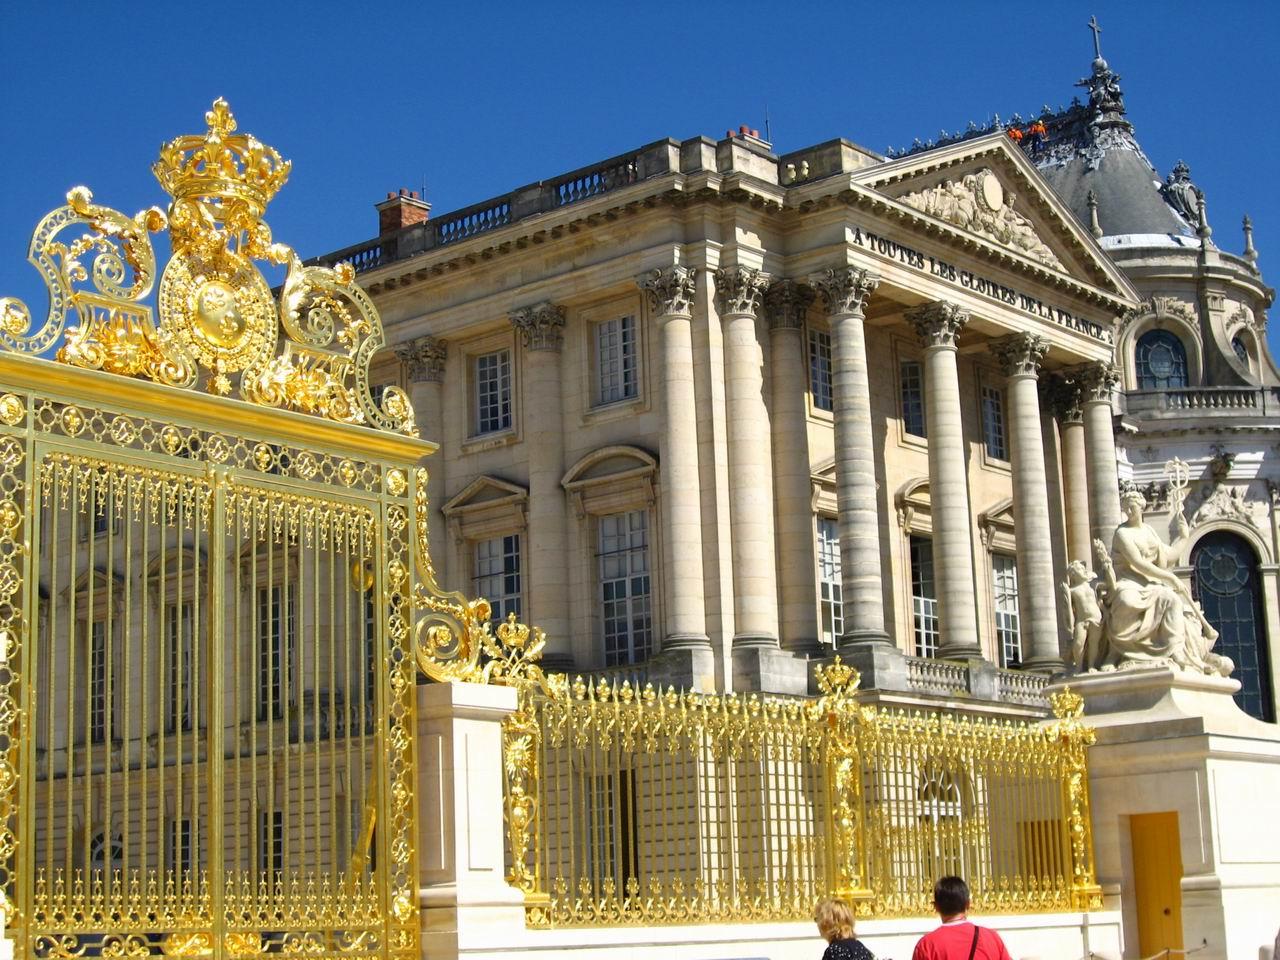 Versailles Paris Inside Paris Panorama City-versailles